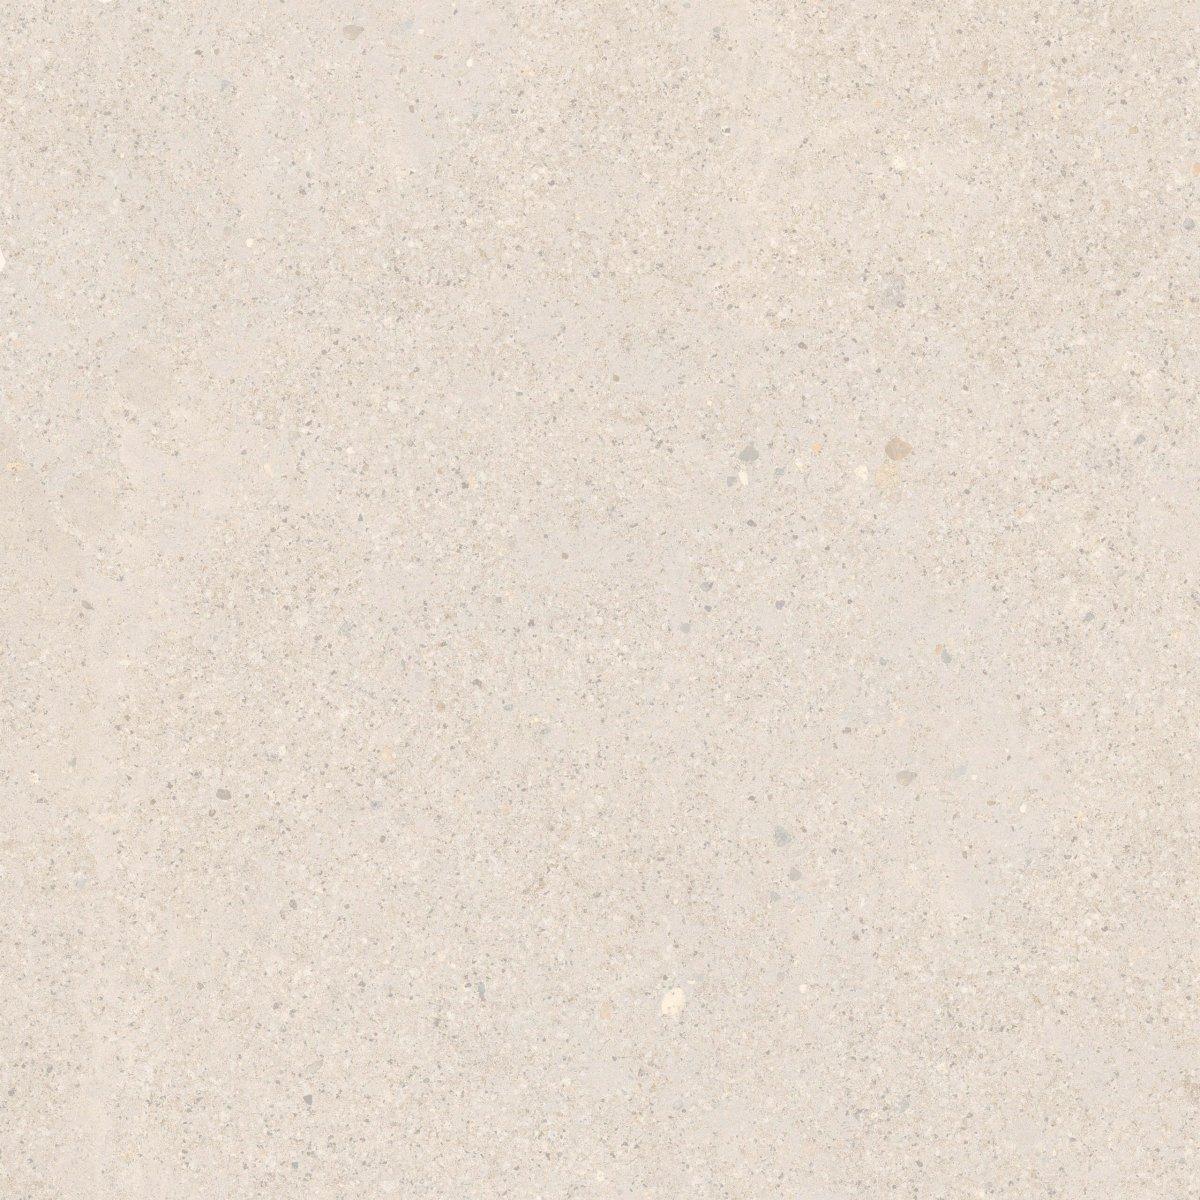 Ceramic Industries Nostalgia White Eco 600x600mm_Stiles_Product_Image